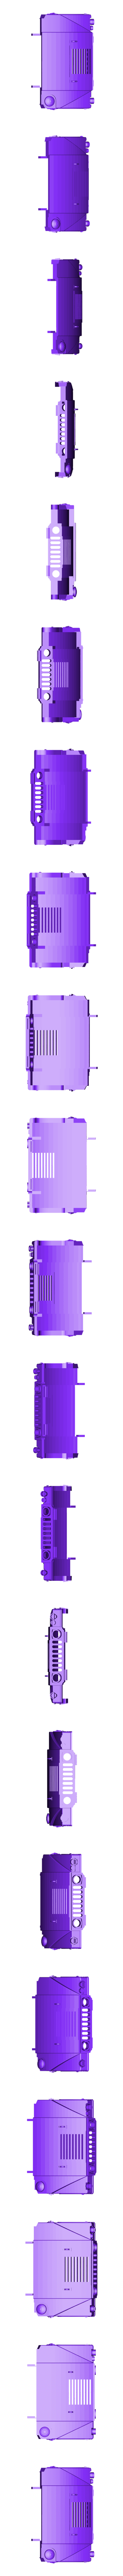 capot1.stl Download STL file HUMMER H1 - Assembly model kit 1:35 • 3D print model, guillesilvestrini